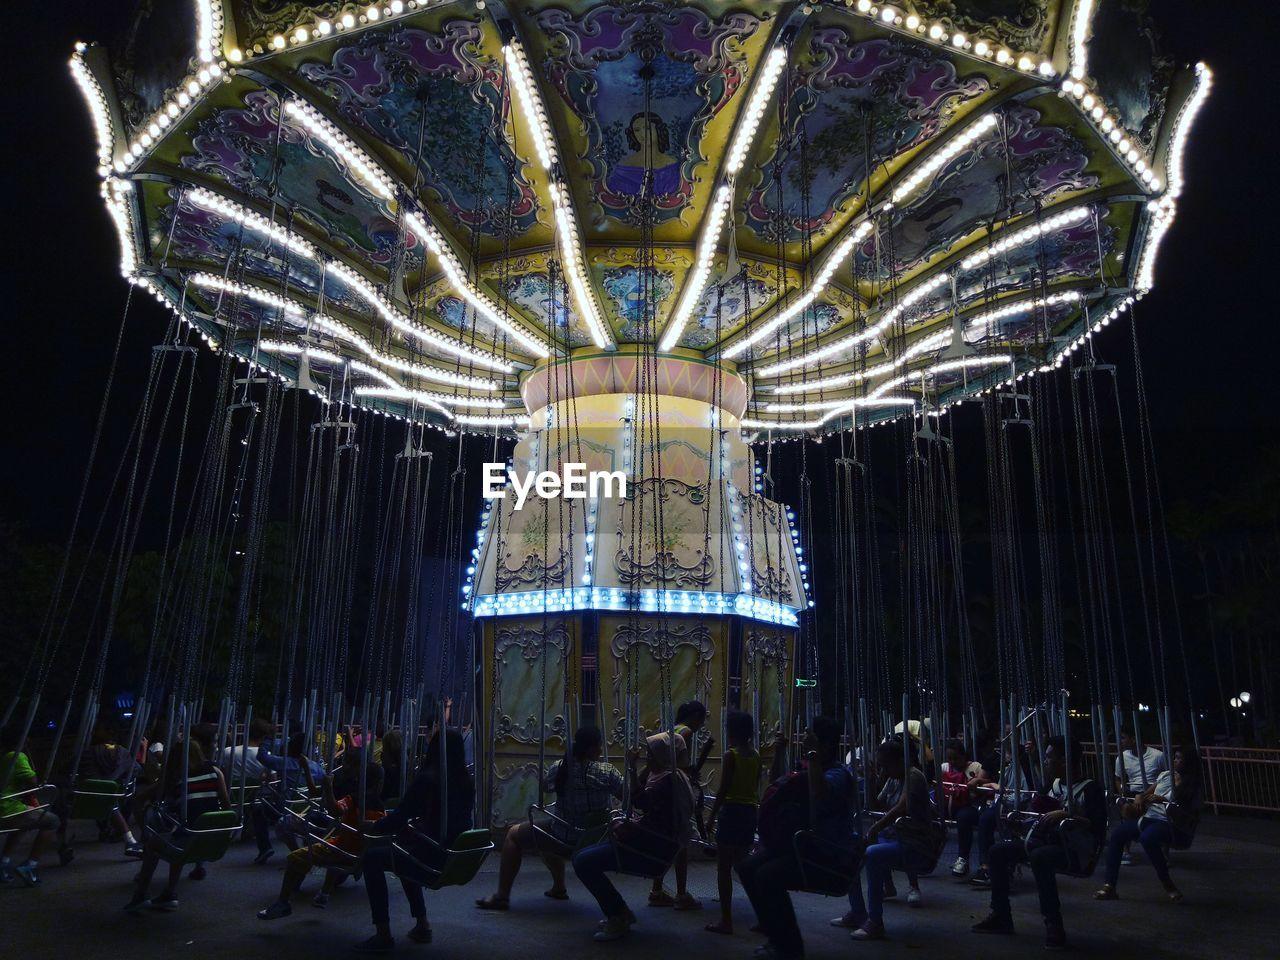 Illuminated chain swing ride in amusement park at night